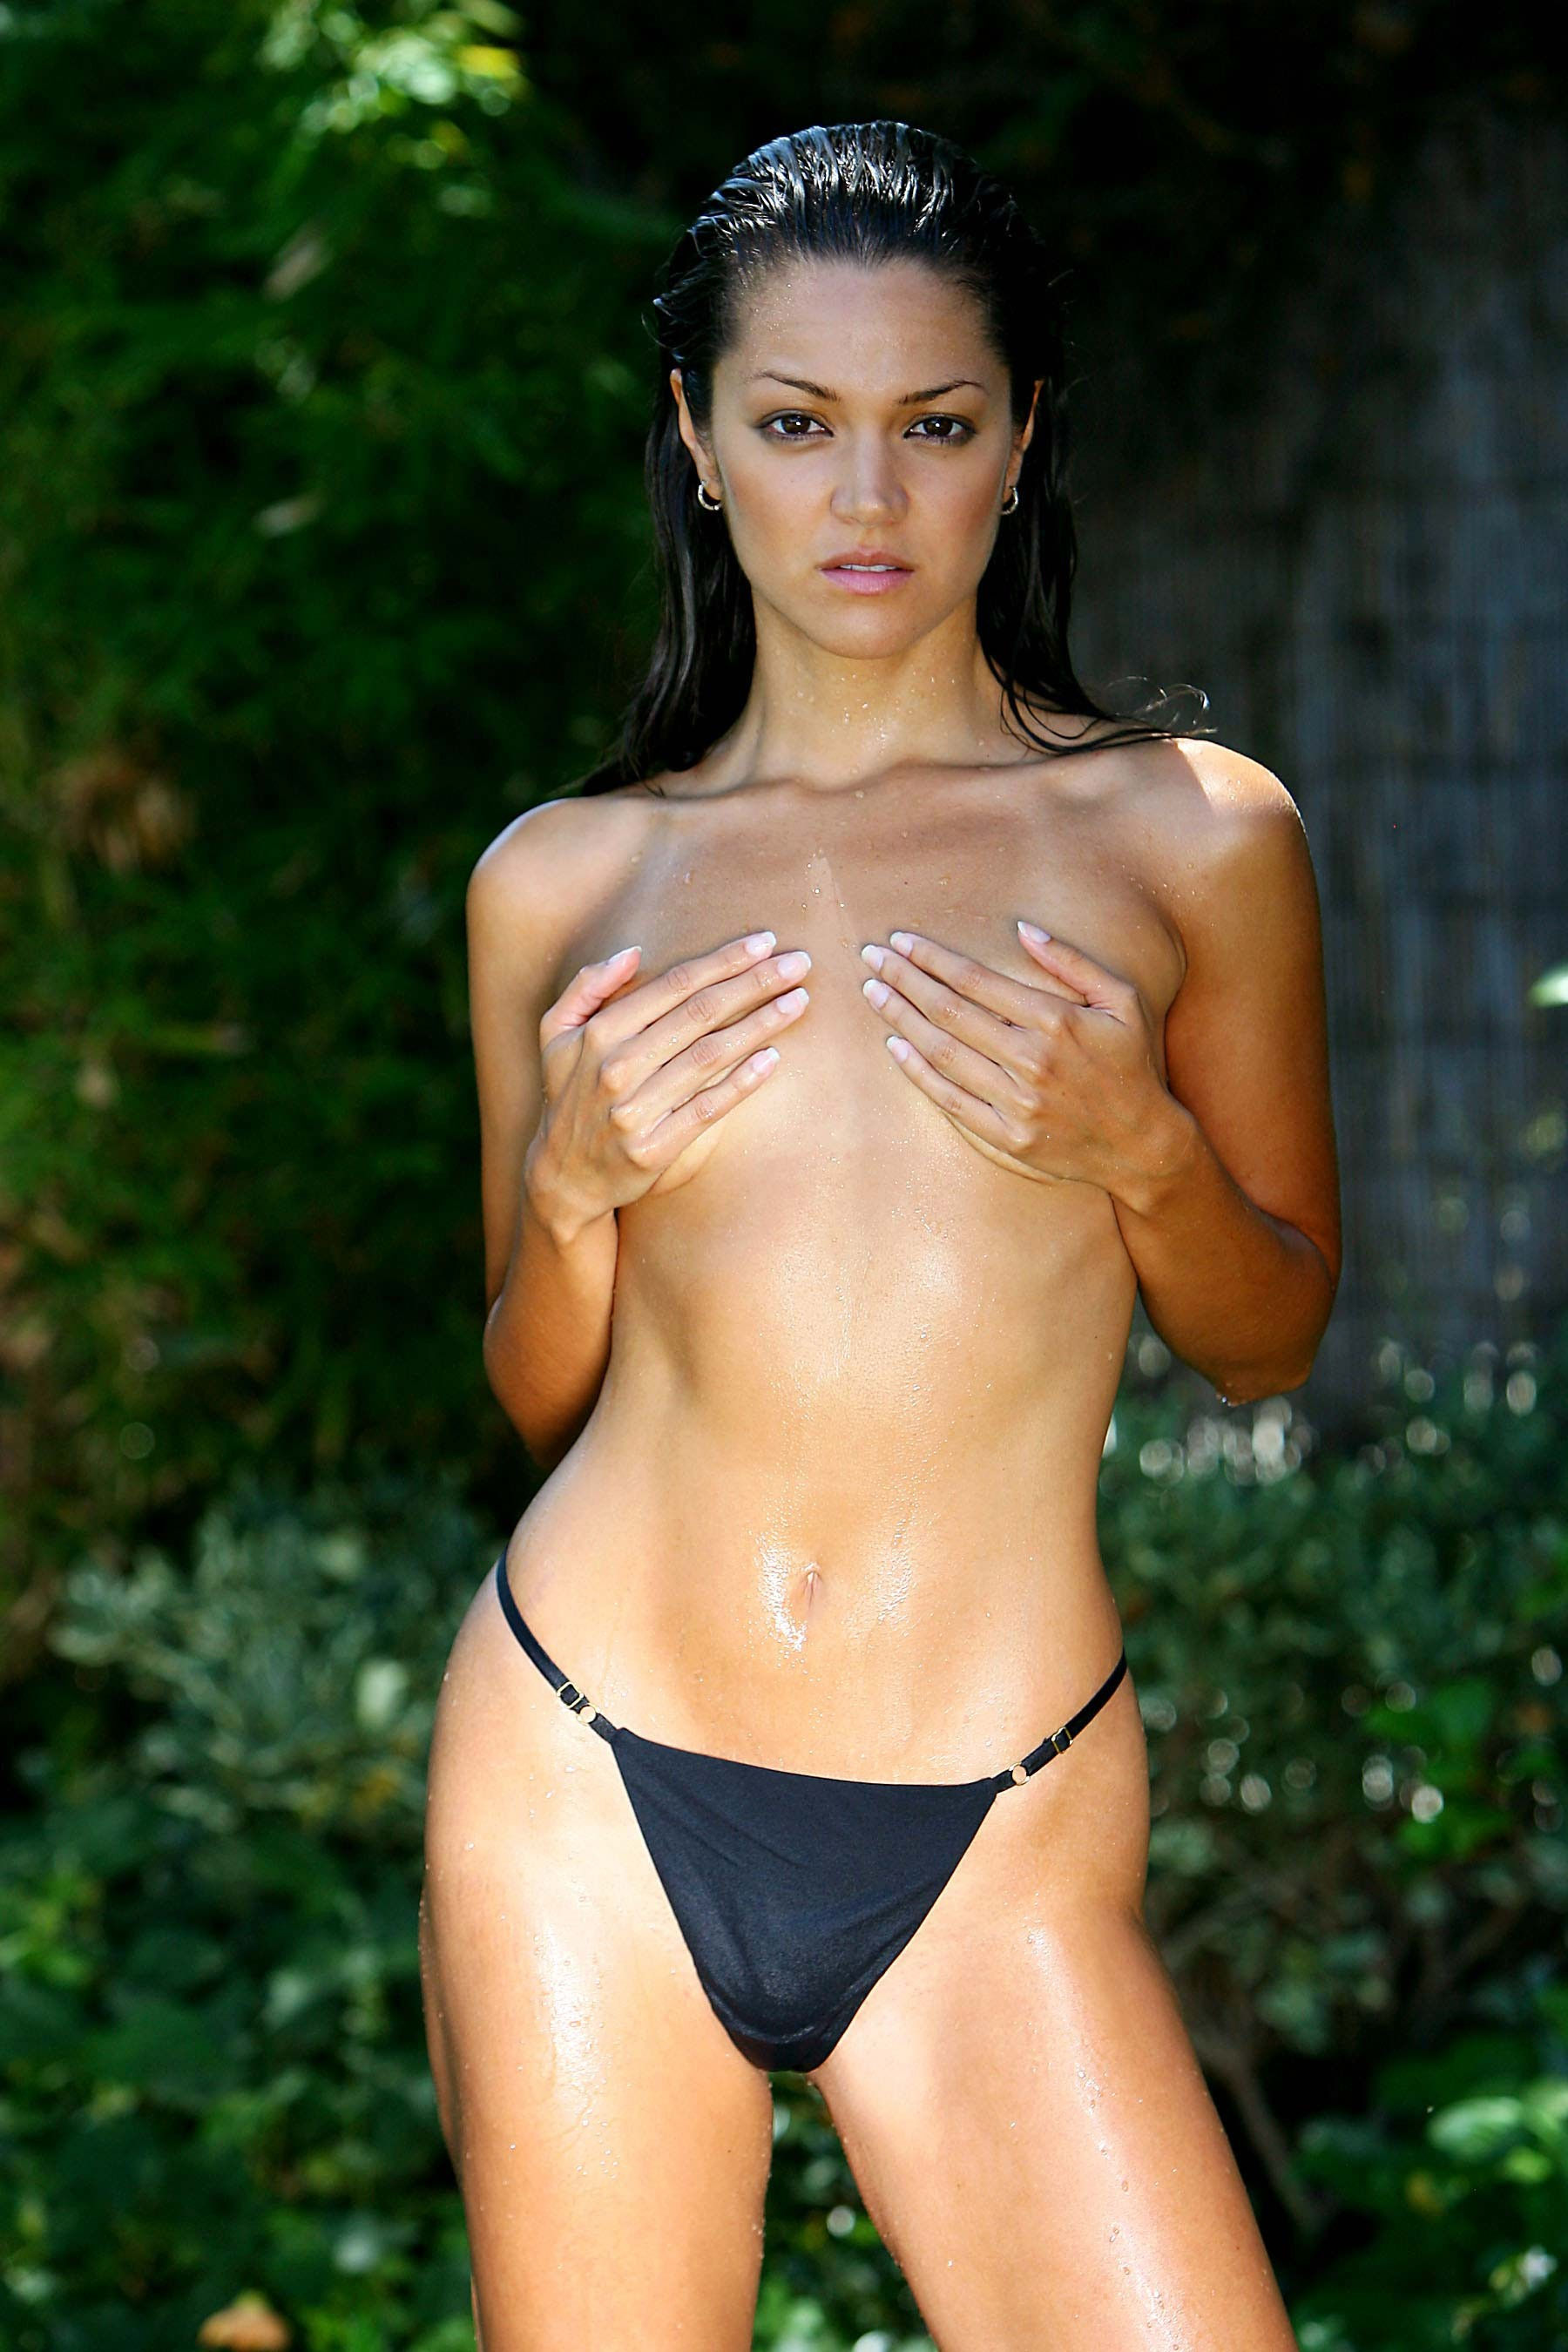 paula garces nude pictures